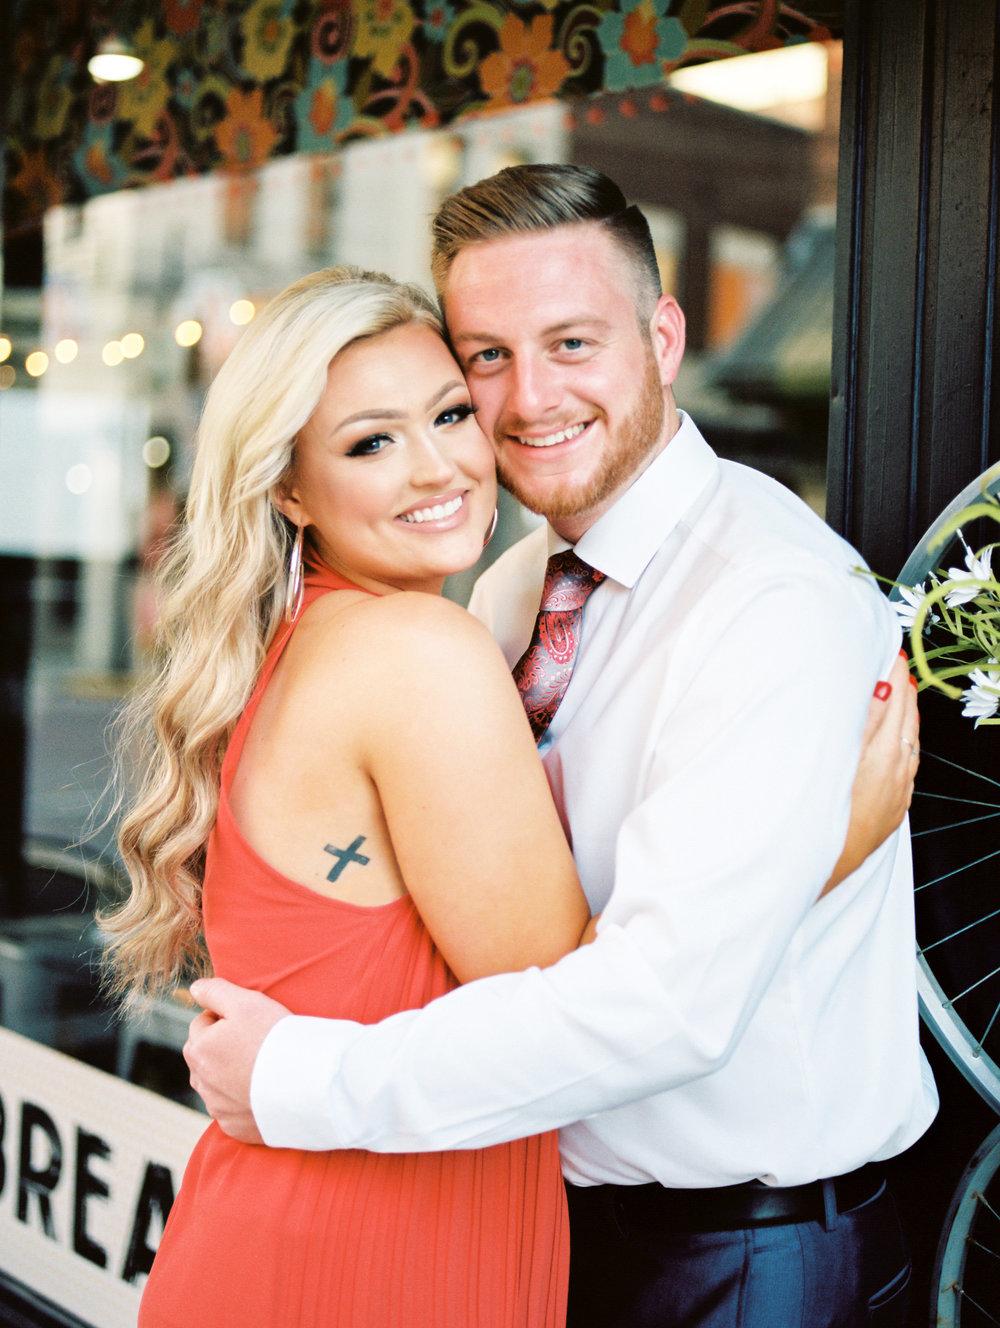 downtown-lexington-wedding-photographer